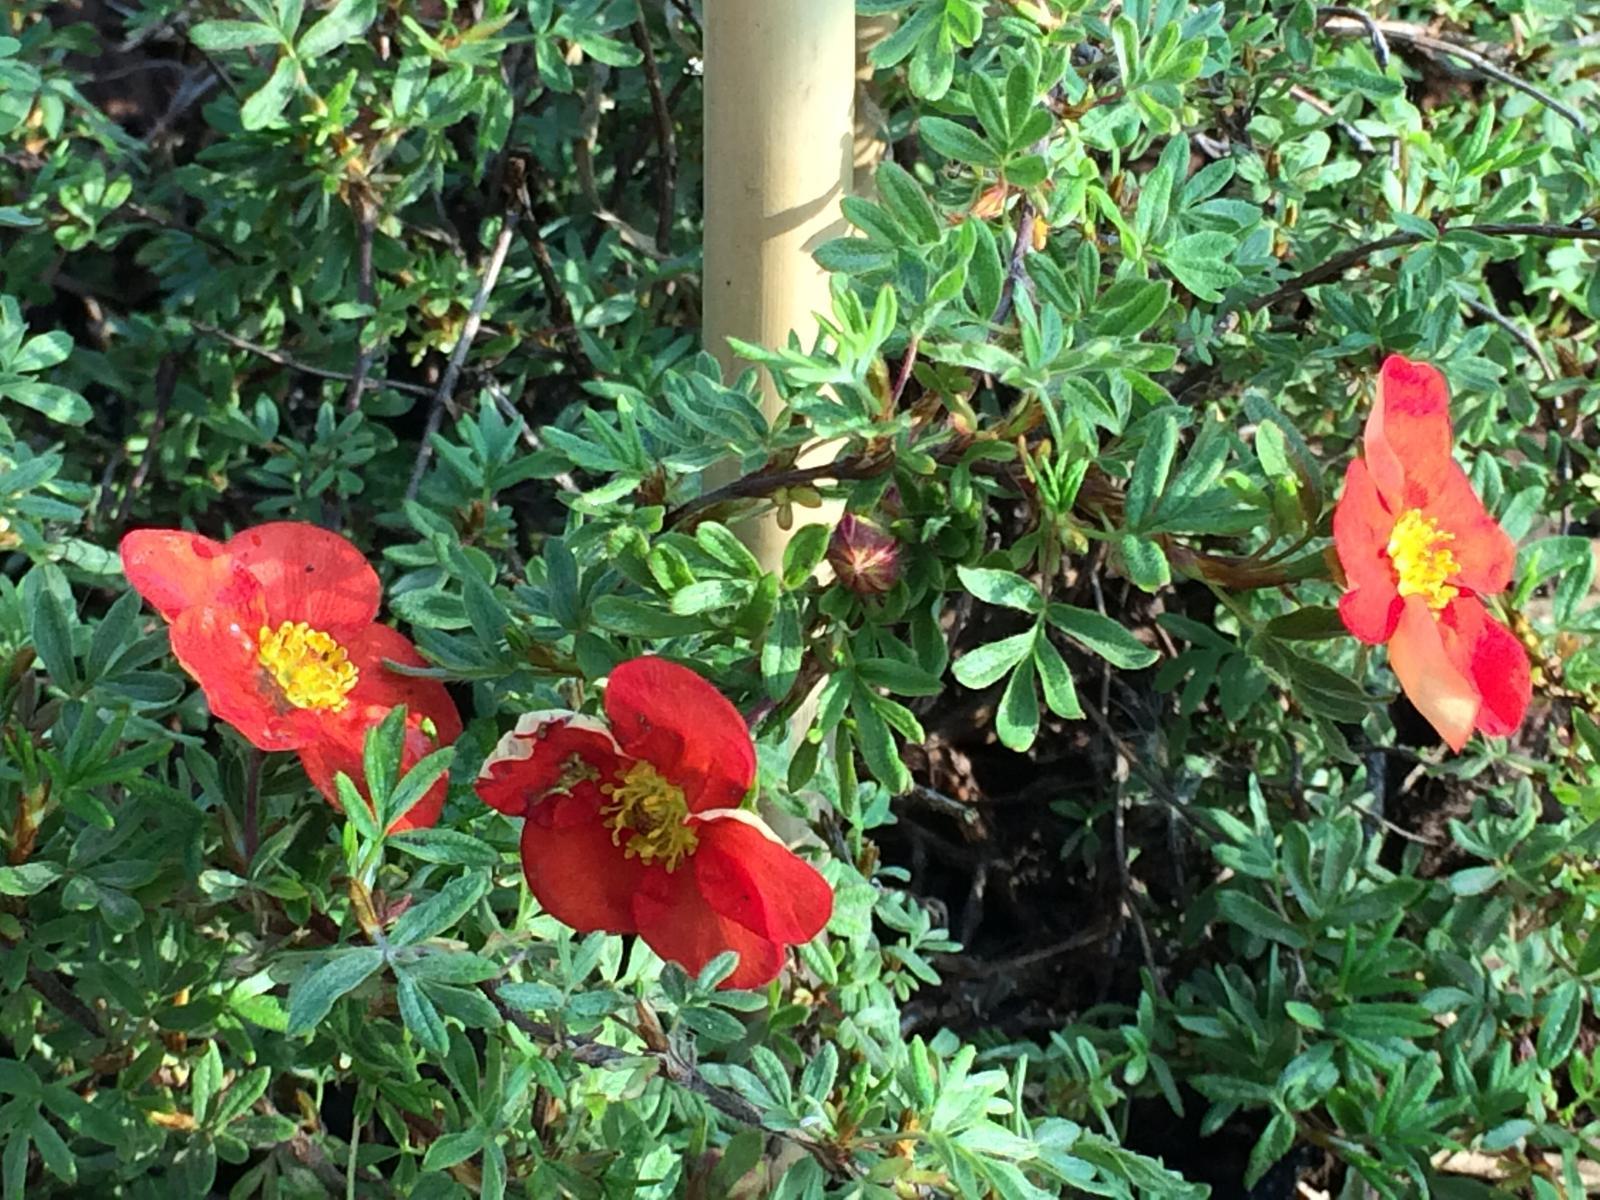 Zahrada- jak to vsechno zacalo.. - Aj mochnicka sa uz prebrala ku kvetu :)